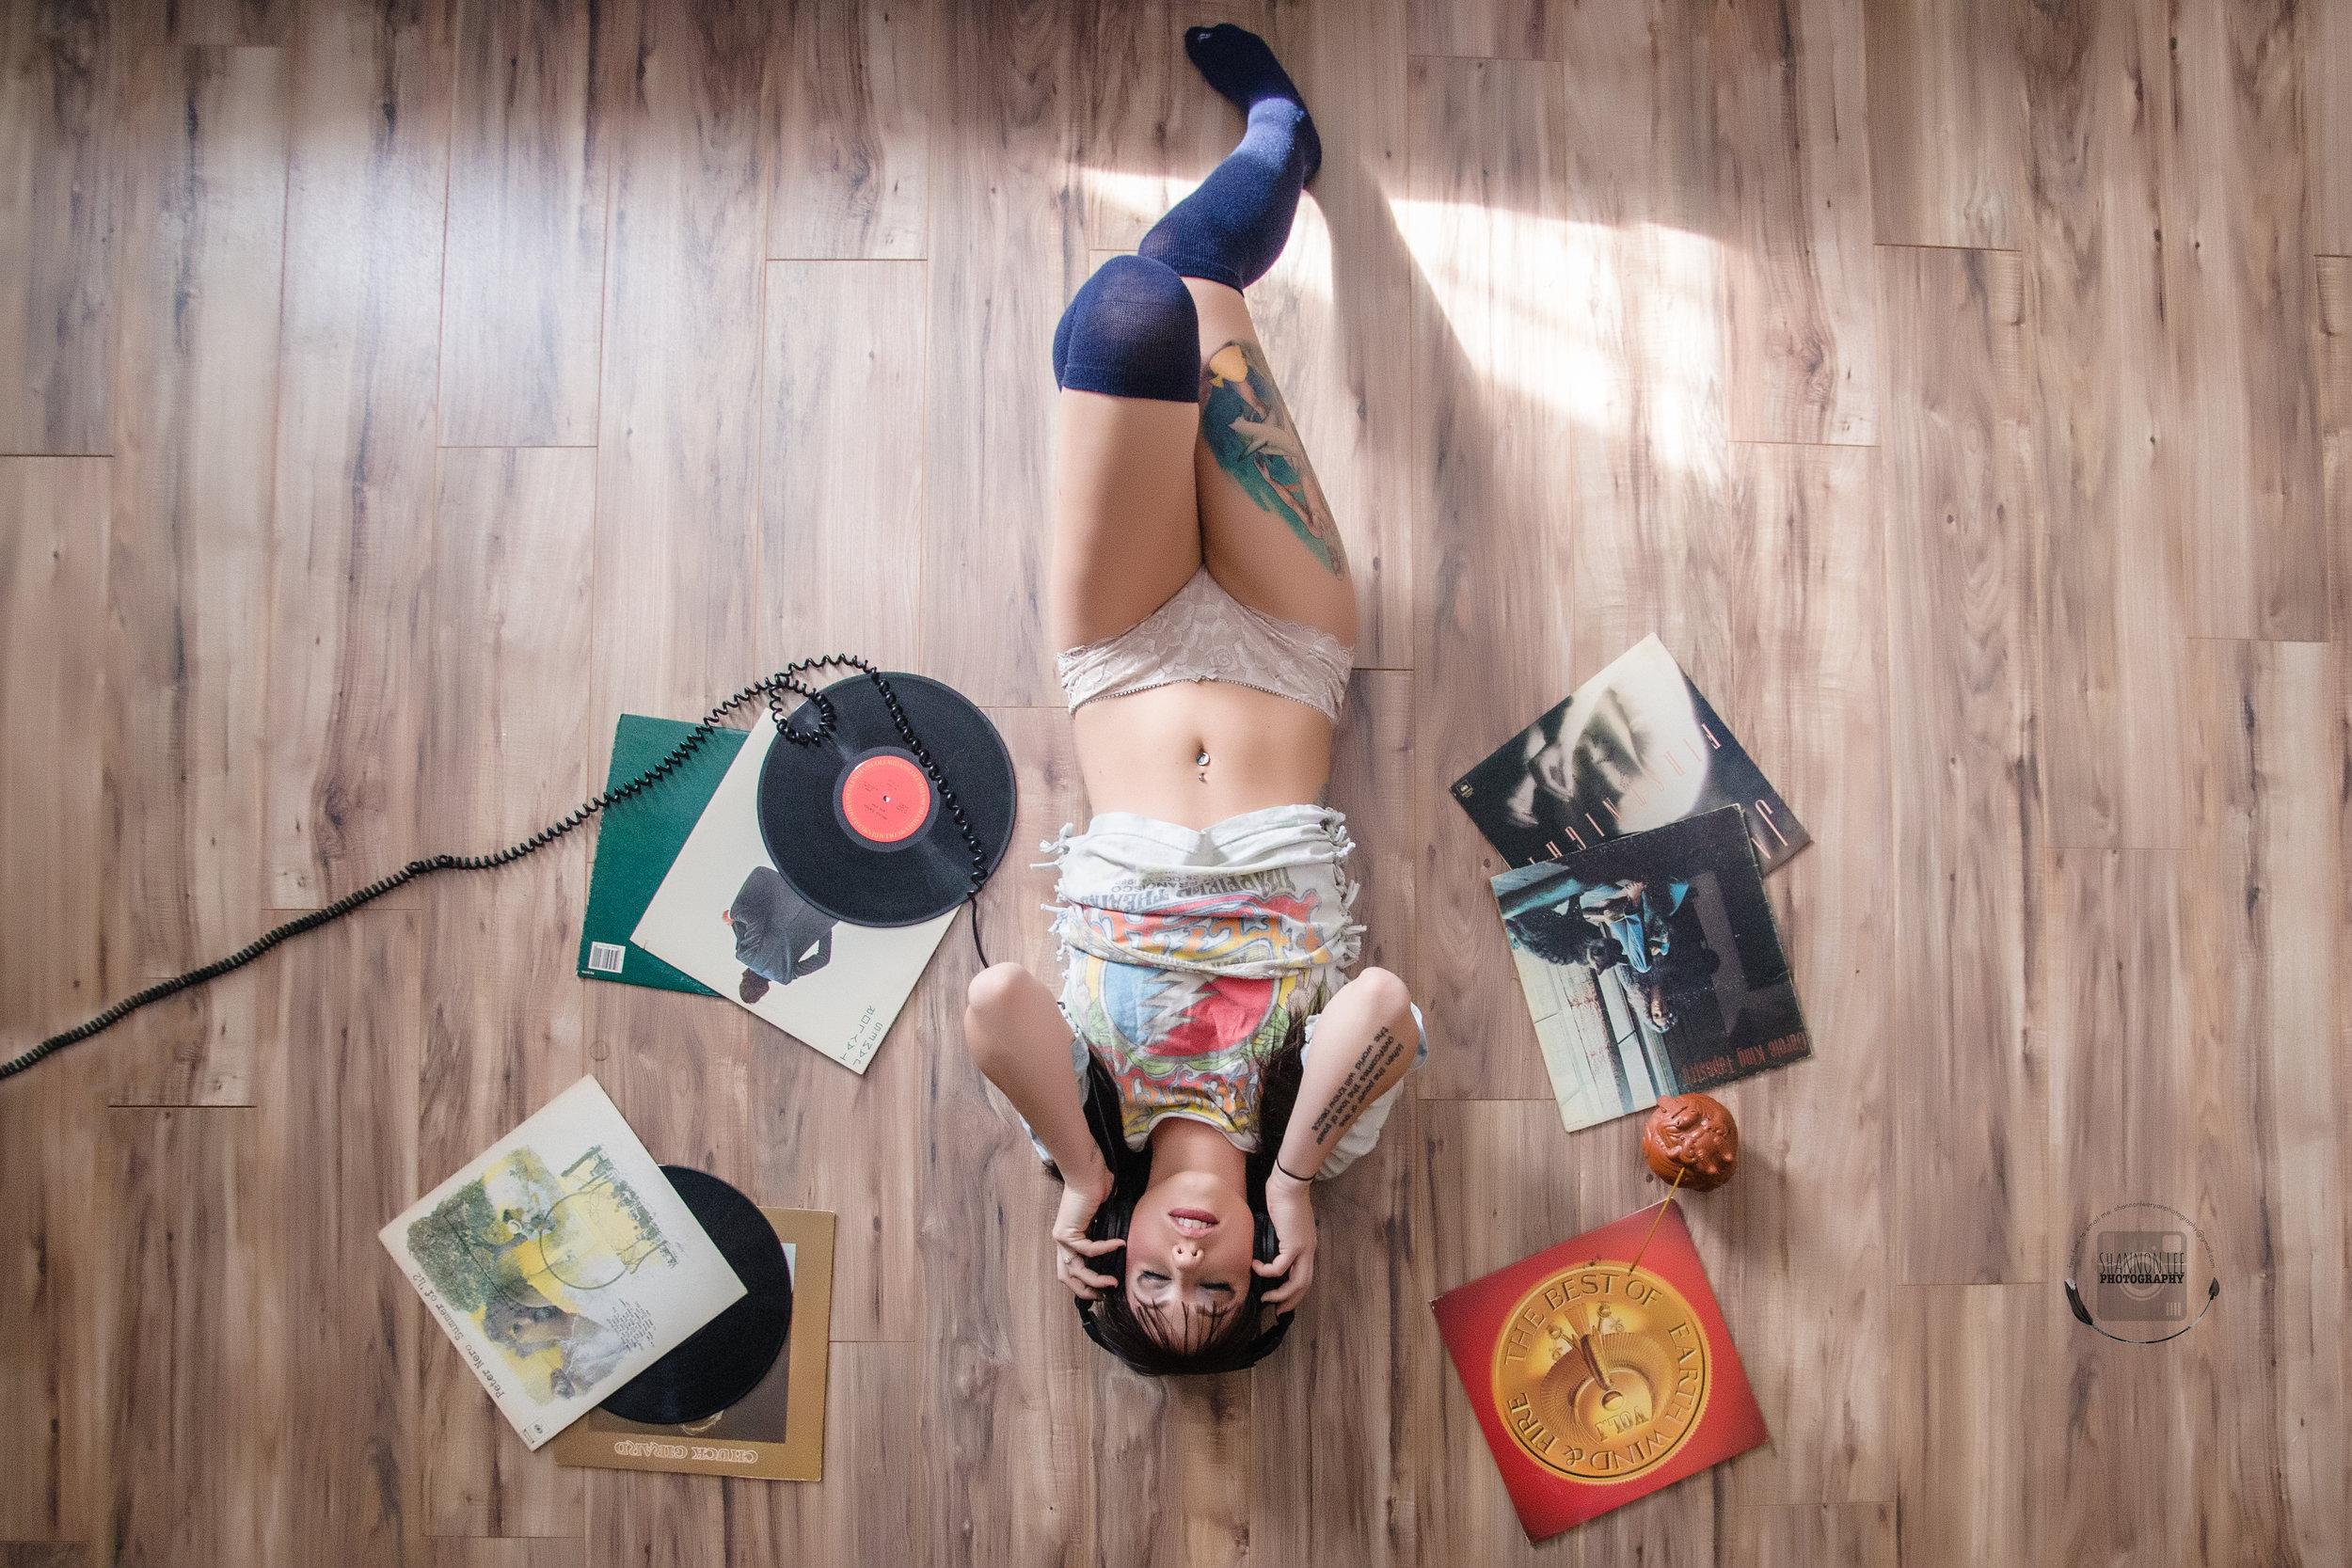 Edgy Boudoir Portrait With A Music Twist